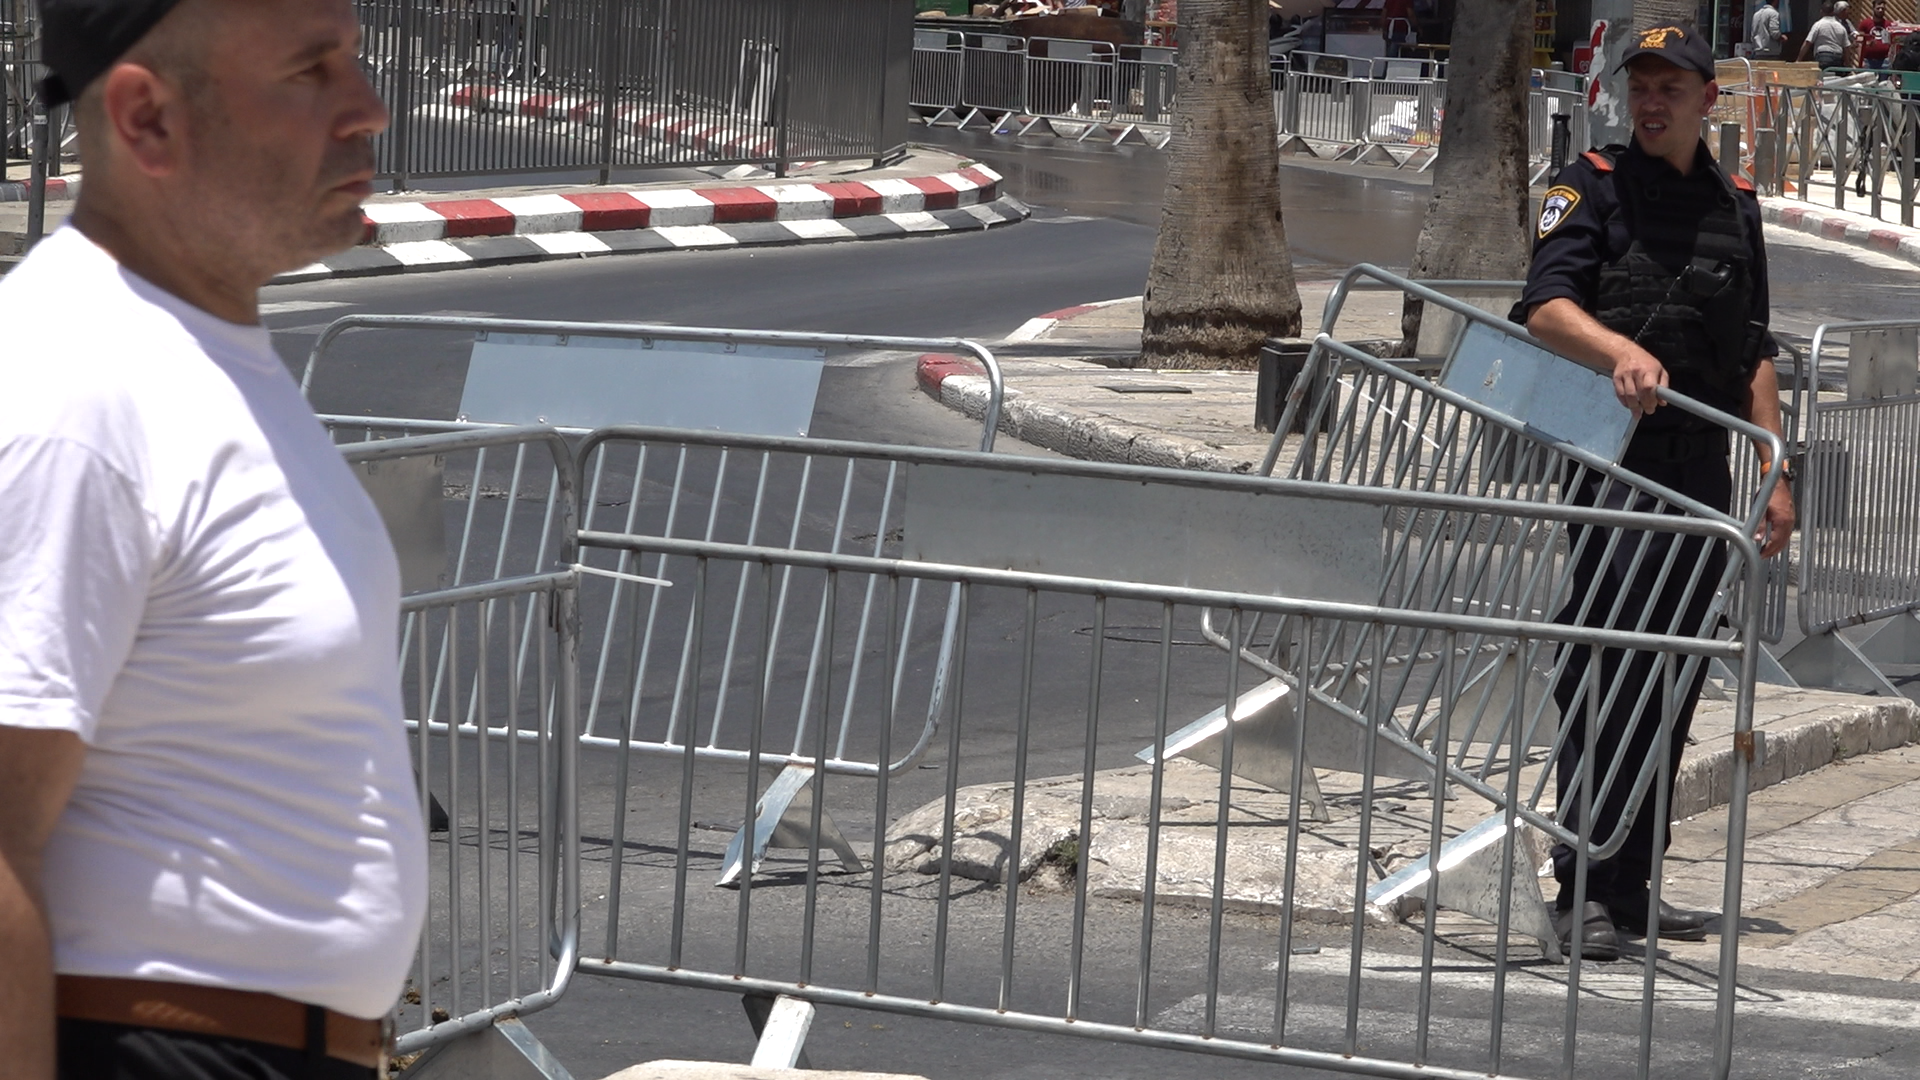 NADAMAR 2018—2020  03:42 min, One channel video Jerusalem, Damascus gate, Israel